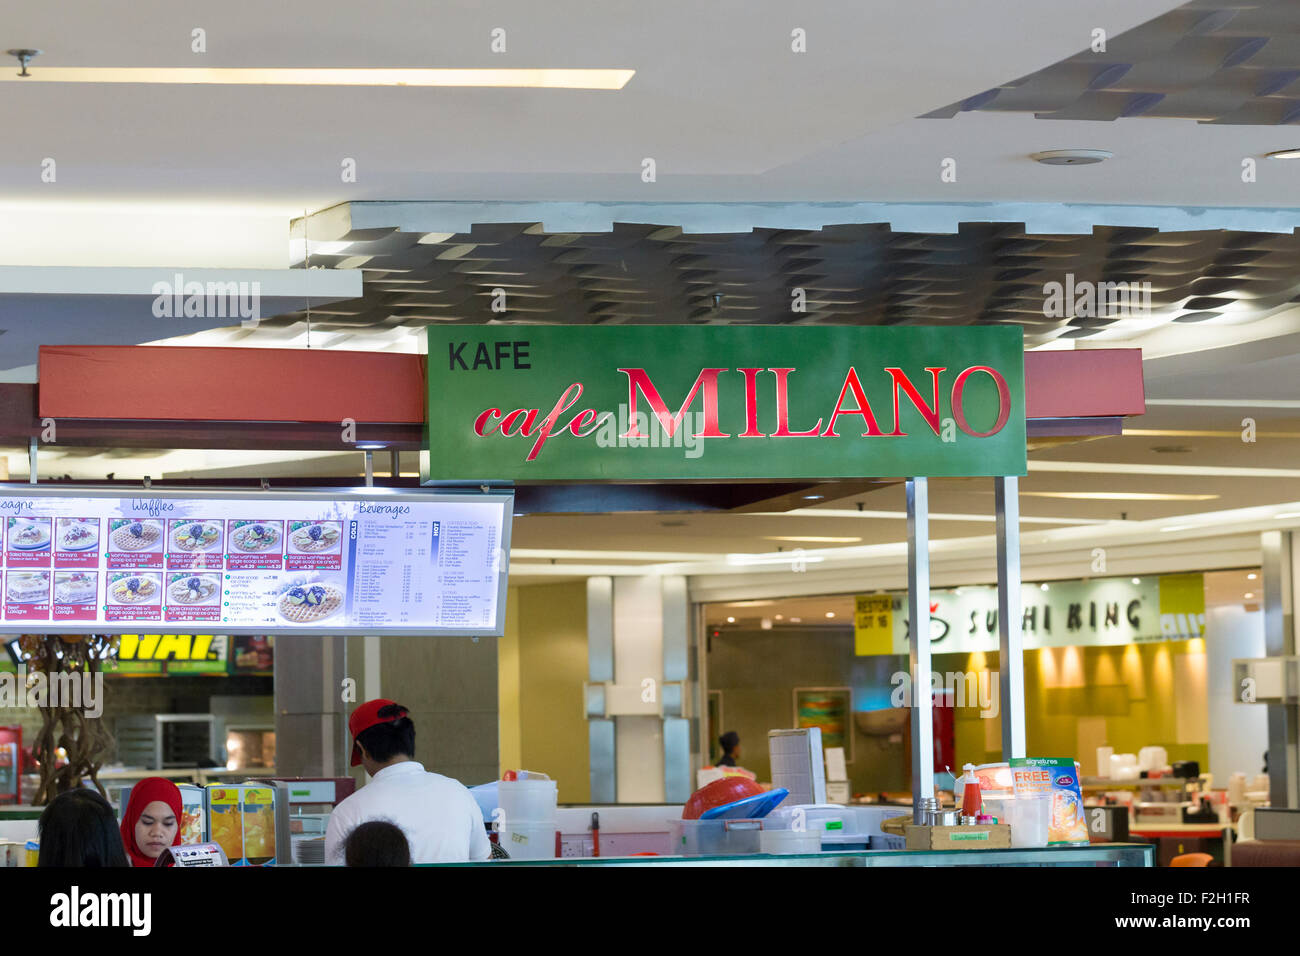 Cafe Milano - Stock Image